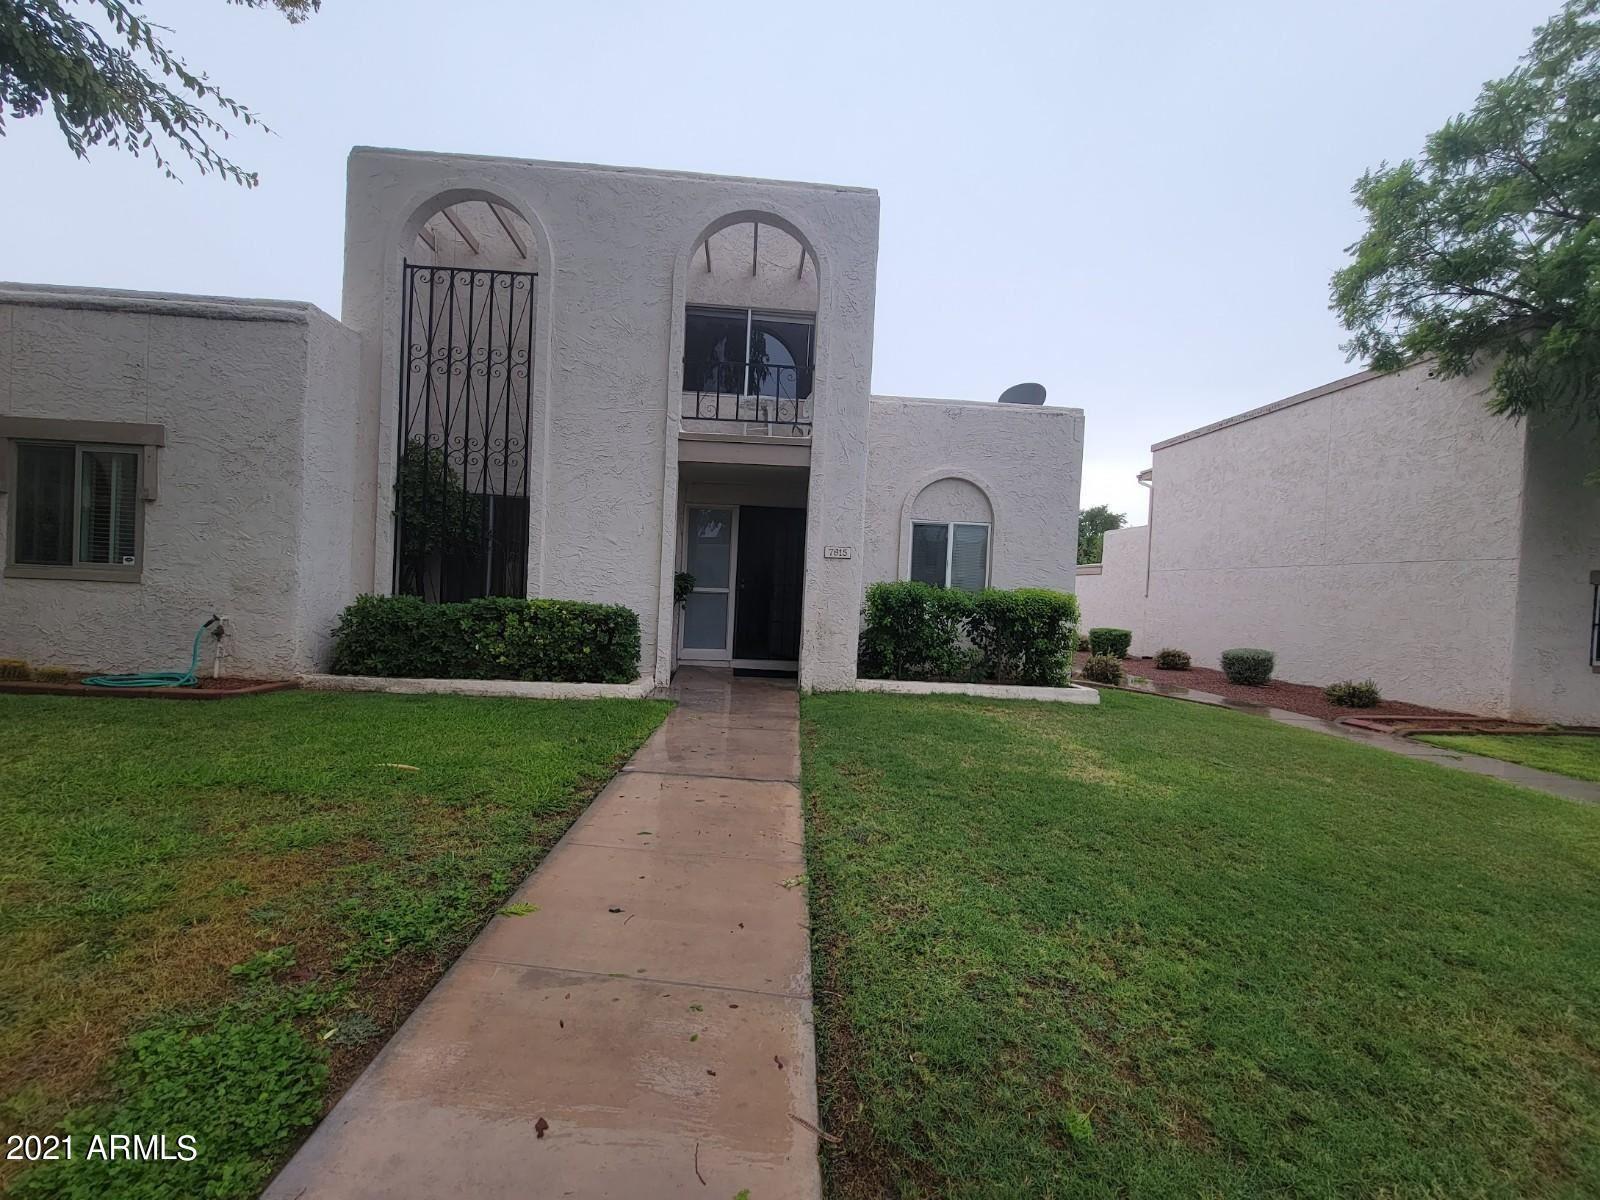 Photo of 7815 E LEWIS Avenue, Scottsdale, AZ 85257 (MLS # 6272602)